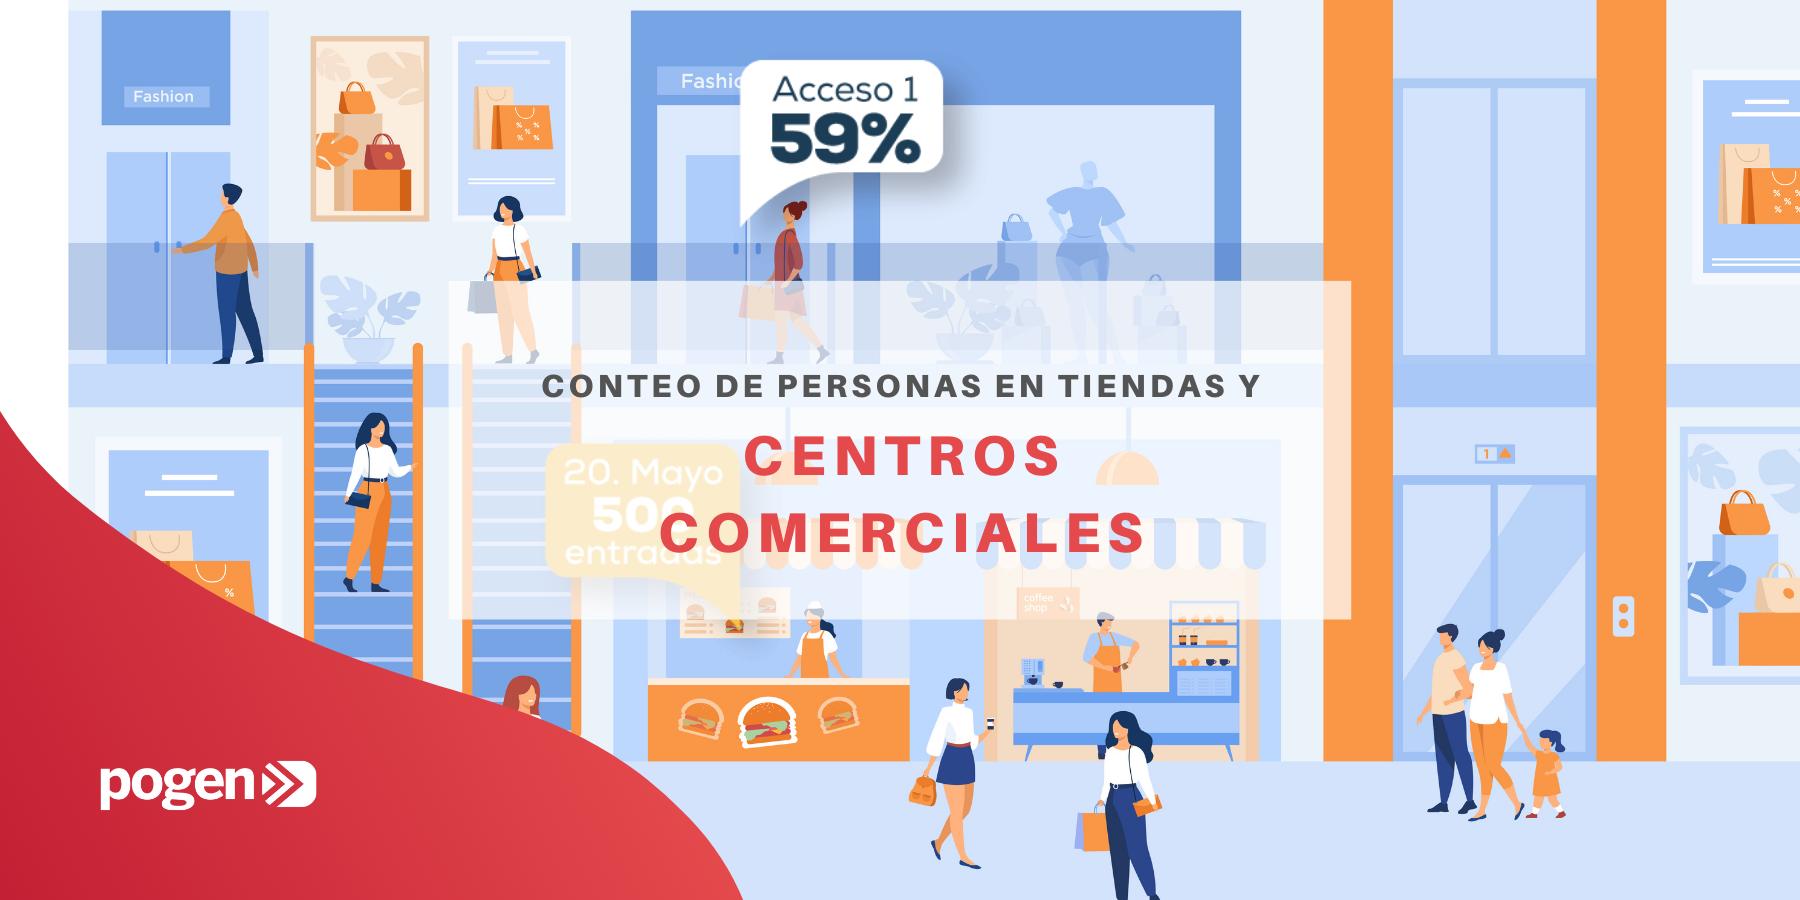 Visitas a centros comerciales disminuyen hasta en un 64%